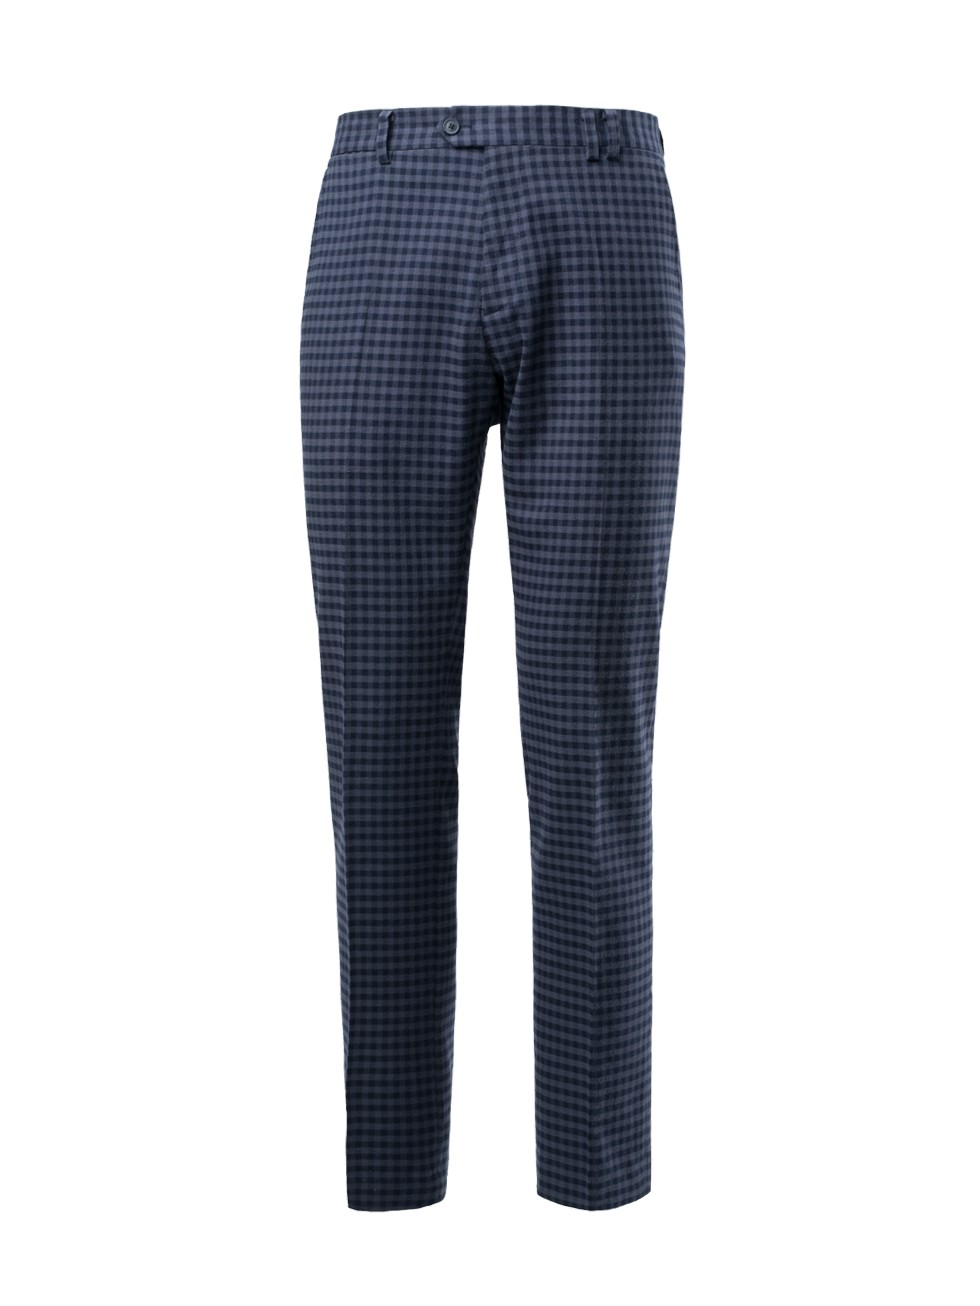 Pantalón tailored estampado vichy marino